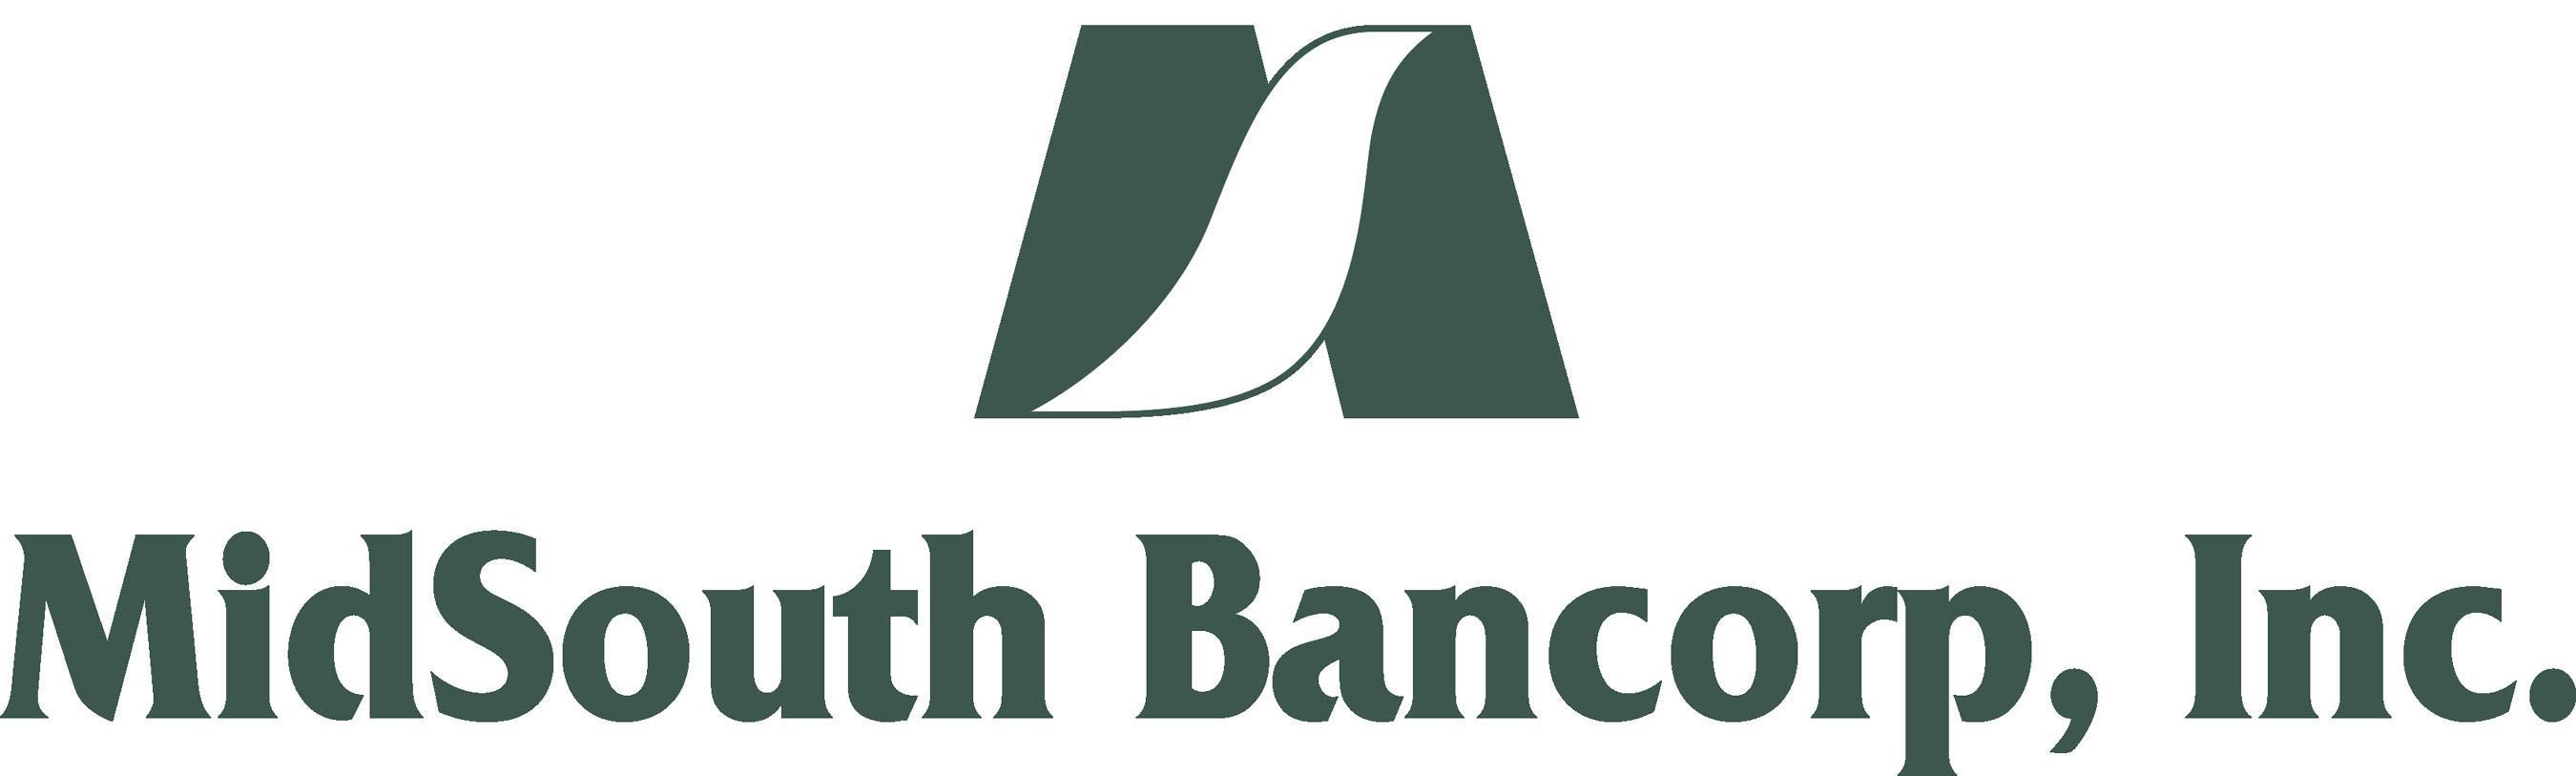 MidSouth Bancorp, Inc. Logo.